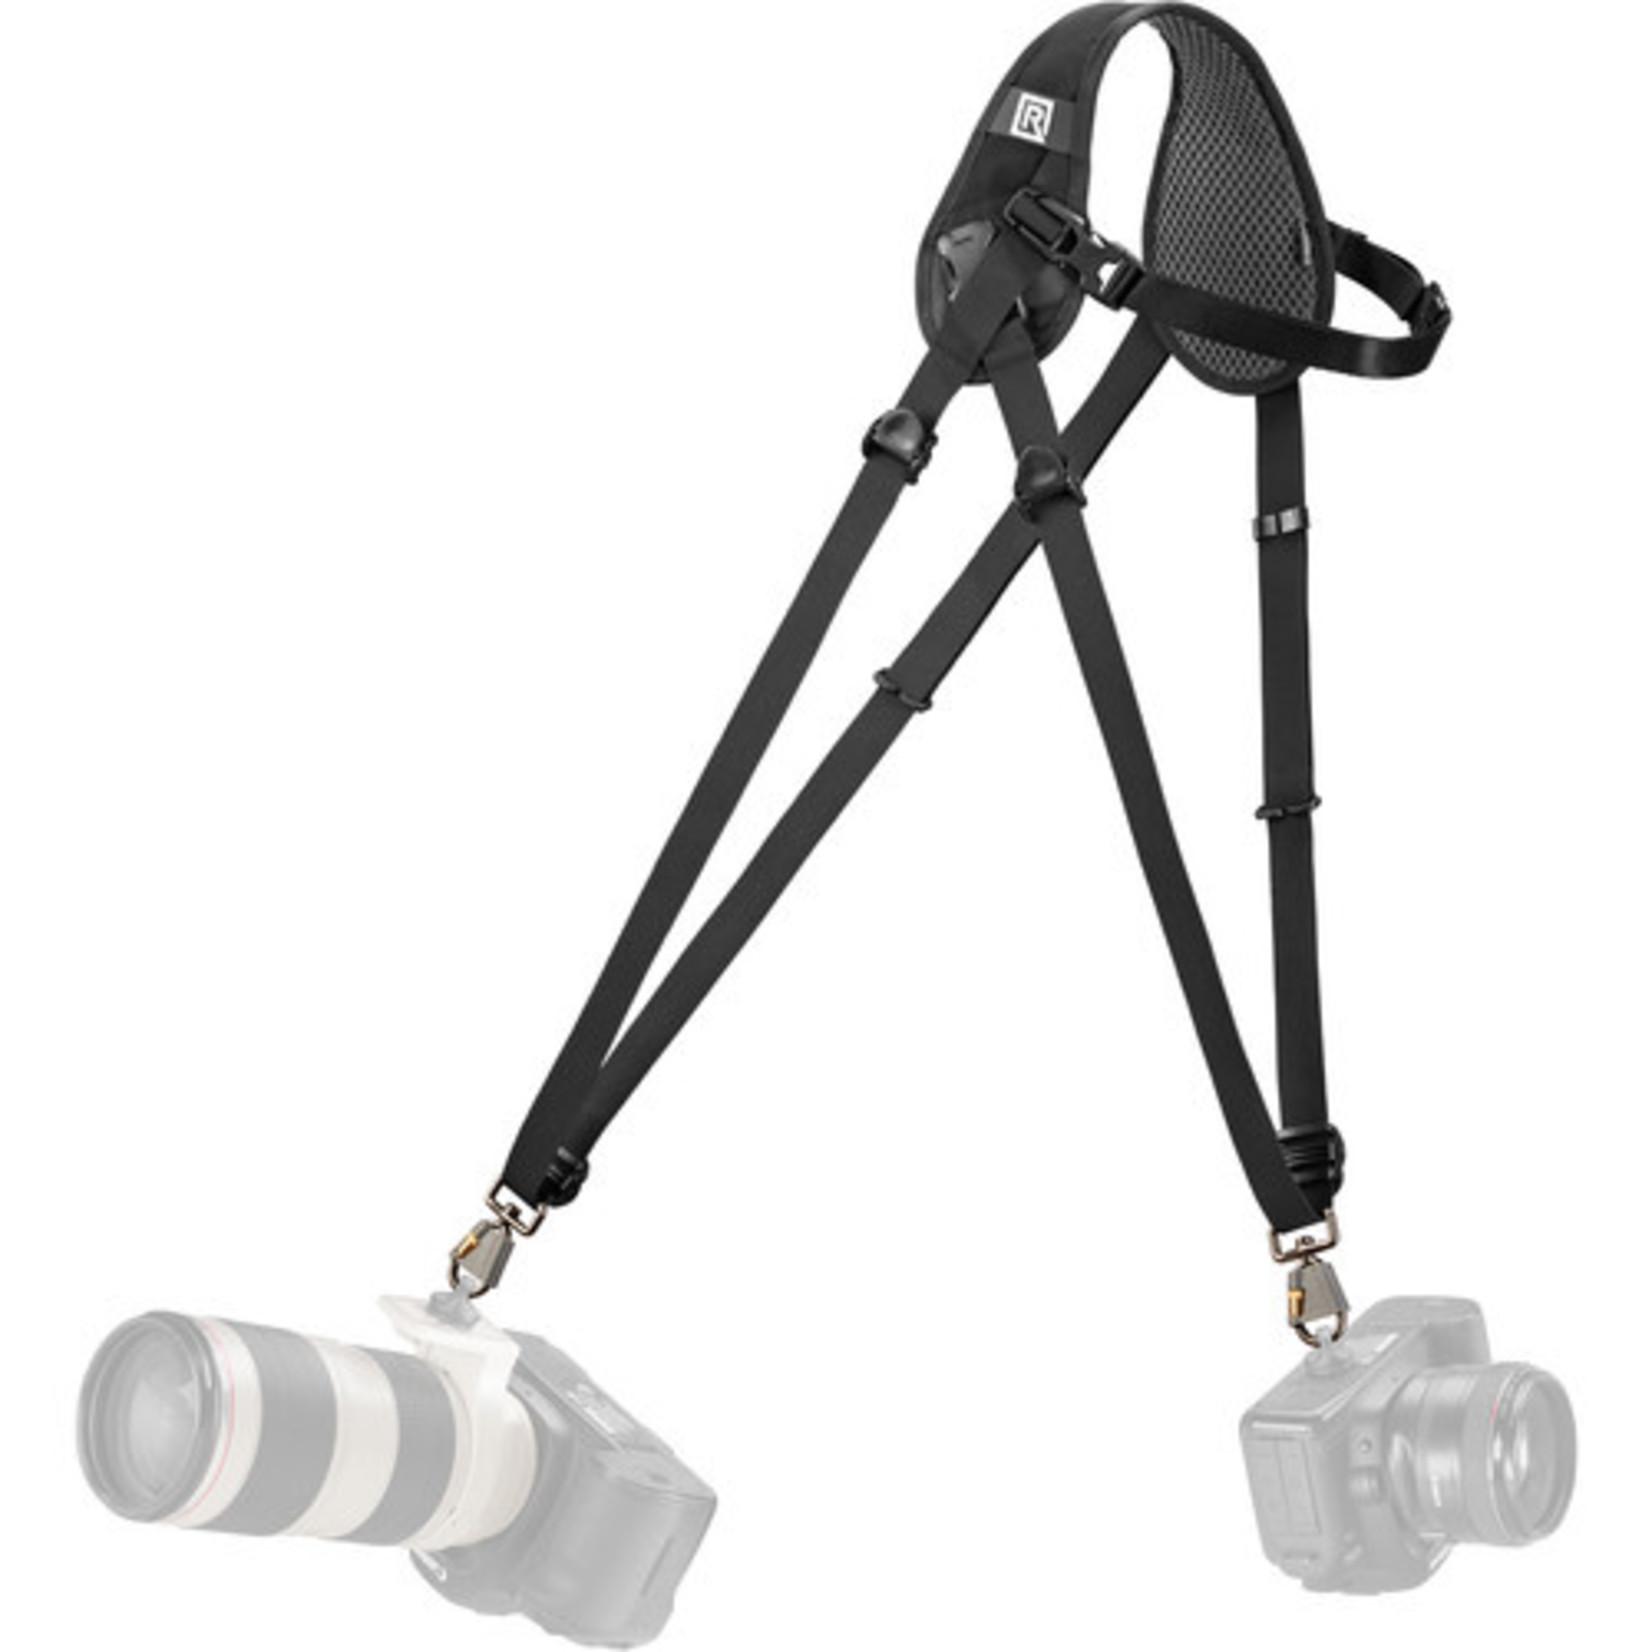 BlackRapid BlackRapid Hybrid Breathe - Double Camera Sling/Strap